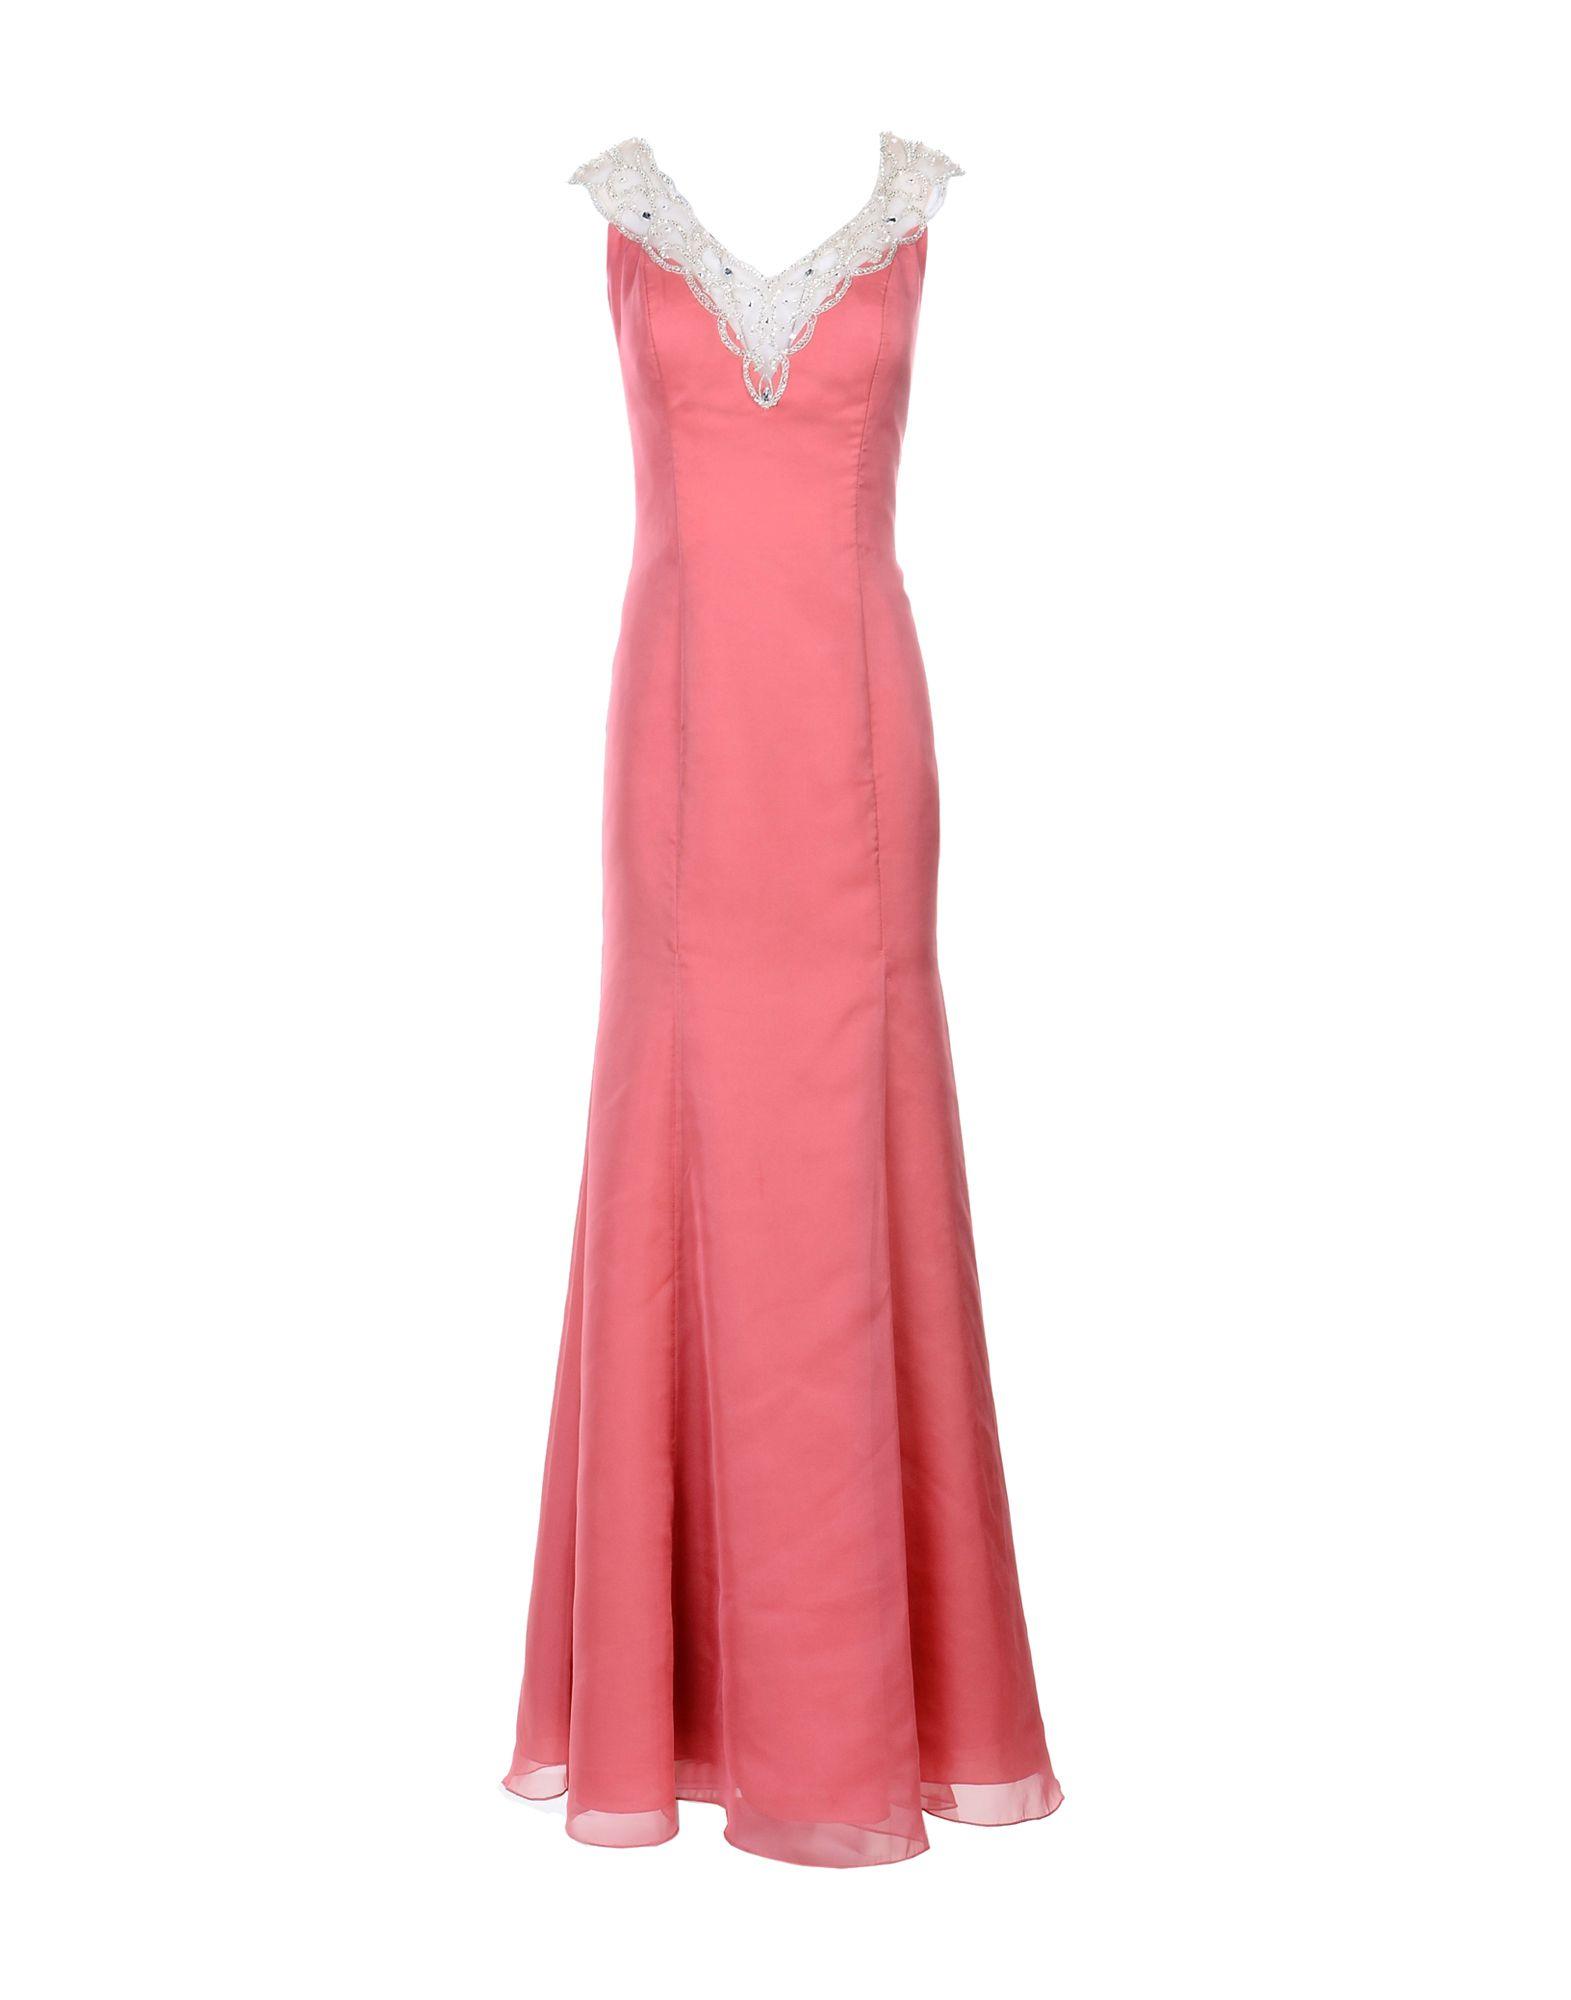 BELLA RHAPSODY by VENUS BRIDAL Длинное платье